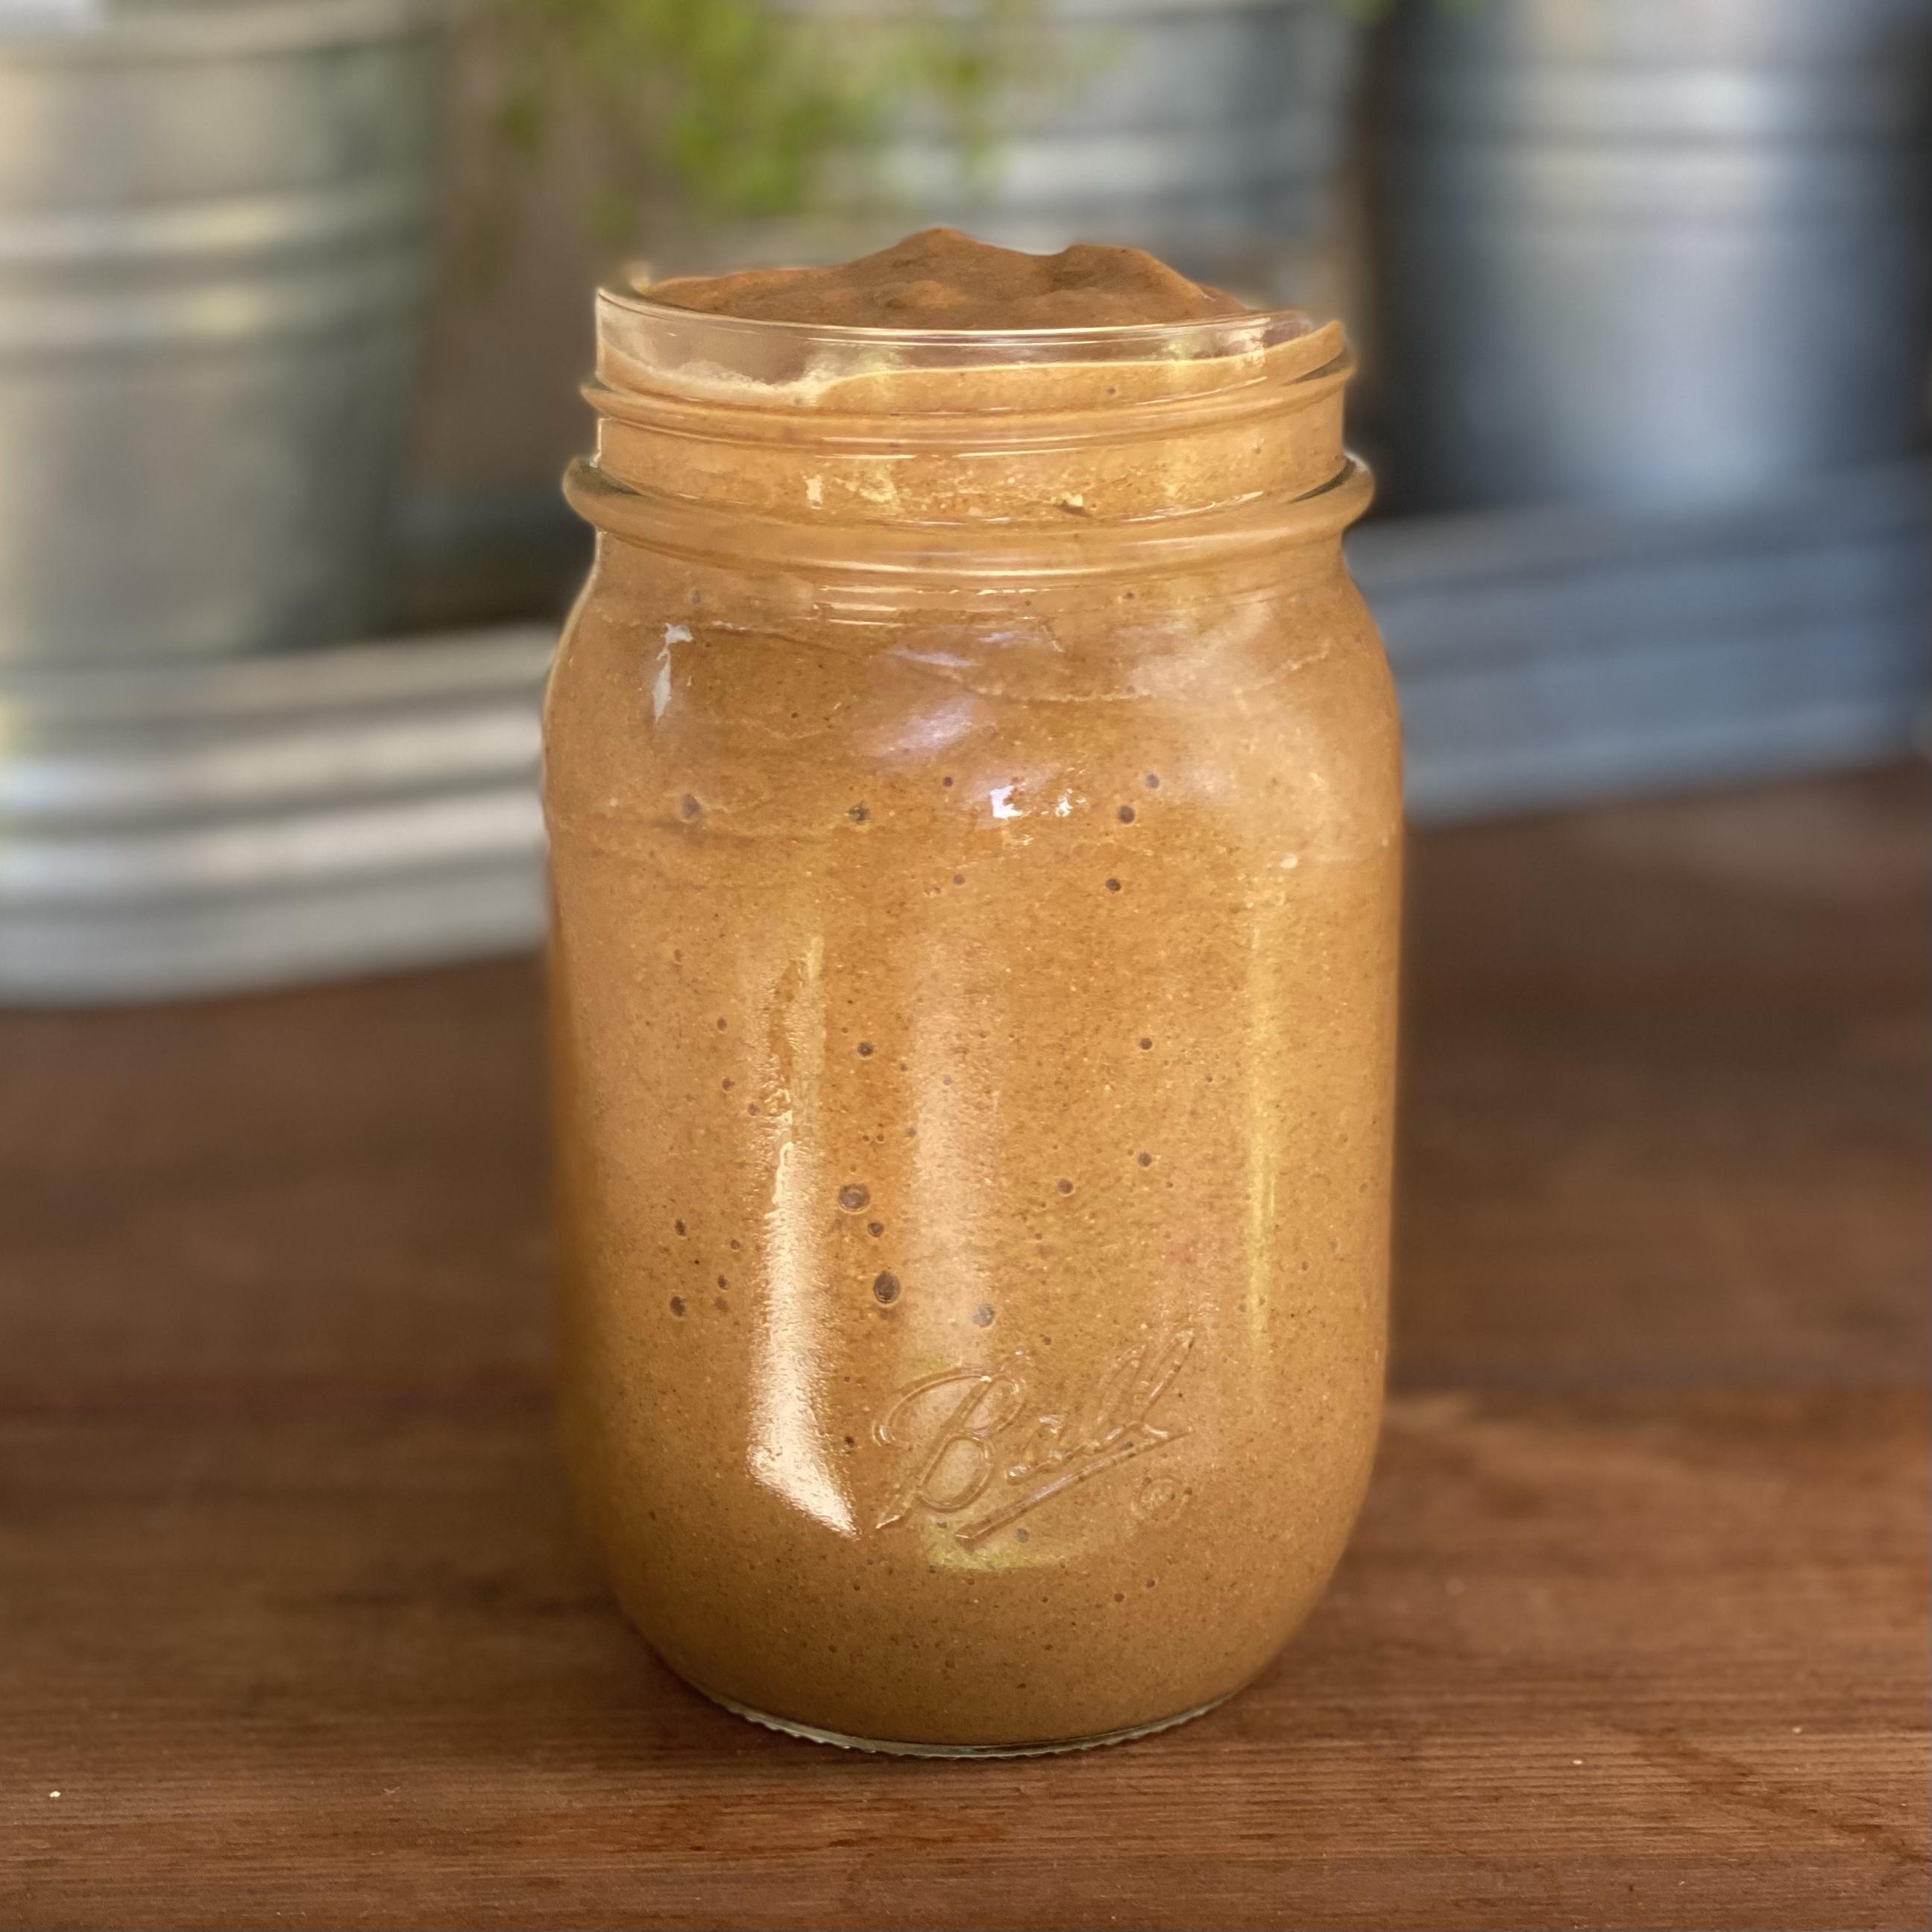 Malted Chaga Chocolate Smoothie with Maca for Hormonal Balance